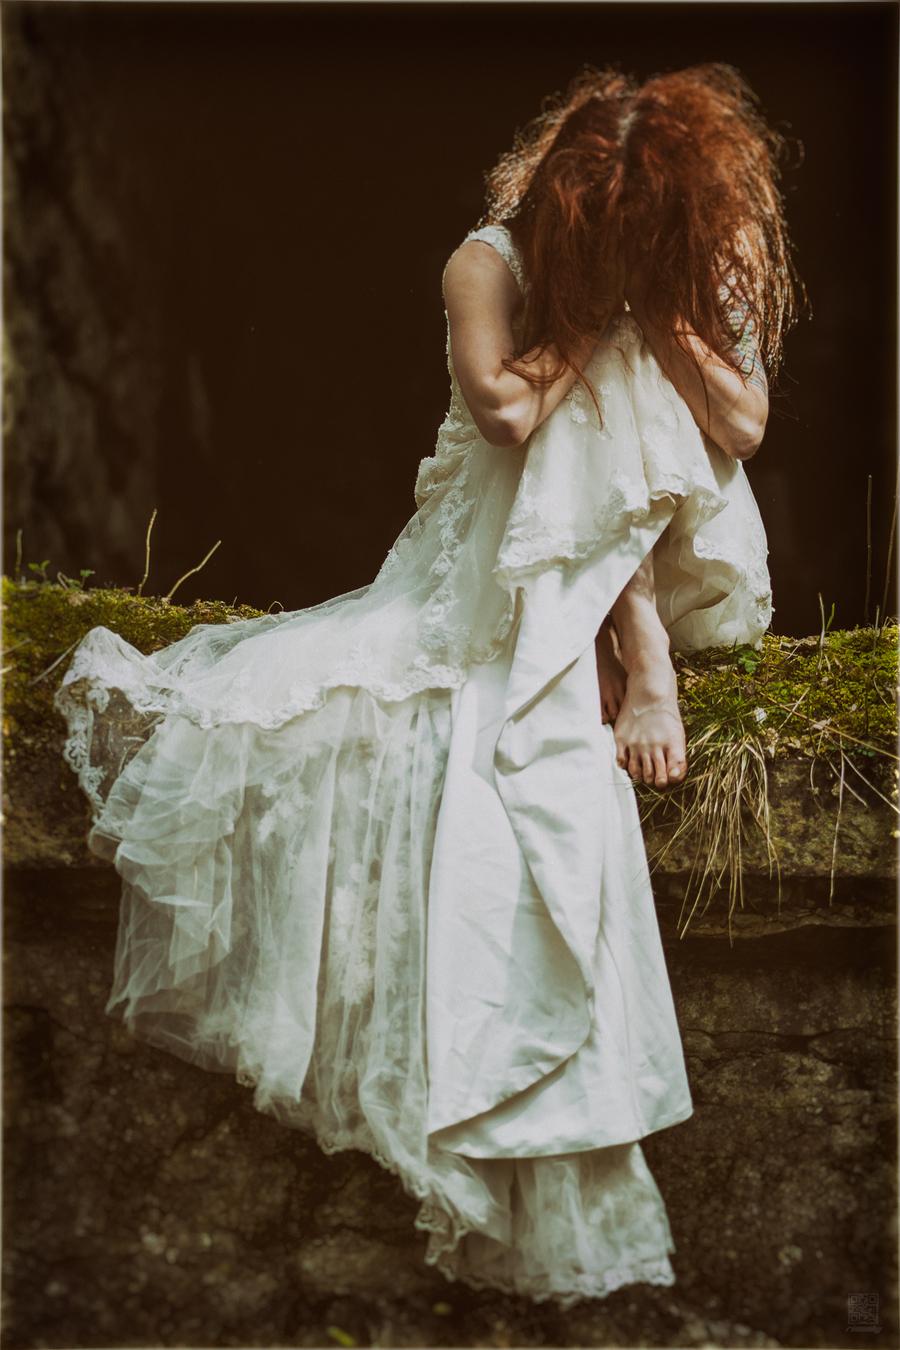 Broken Heart / Photography by rimфsky°, Model IrisFerret / Uploaded 15th April 2017 @ 07:41 AM